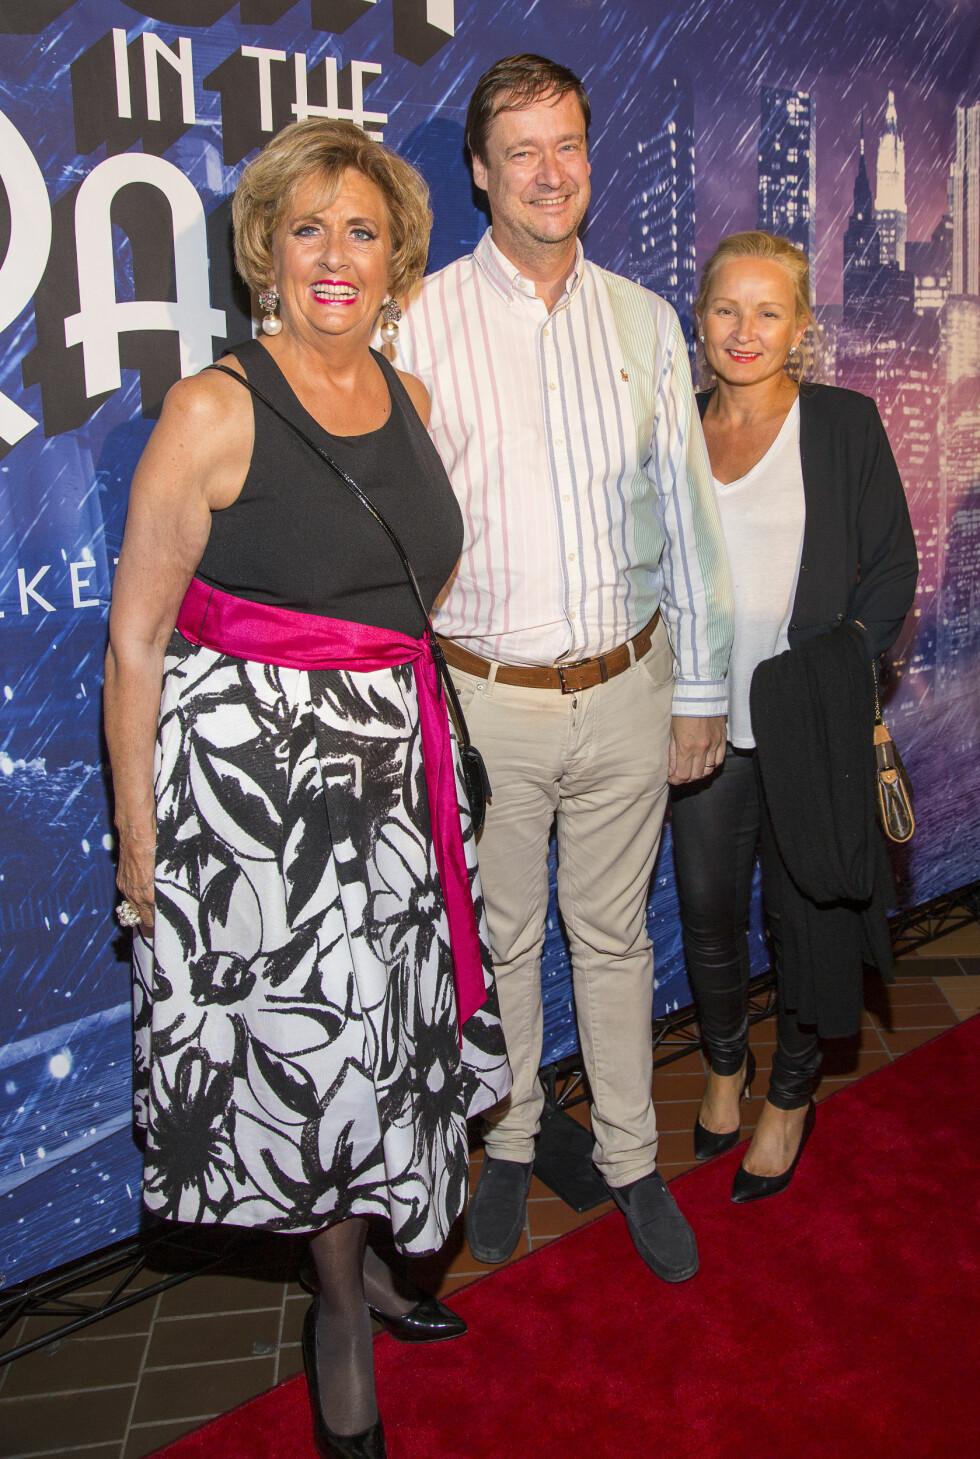 John Christian Elden med kona Sol og eks-ordfører Turid Drevland Foto: Tor Lindseth